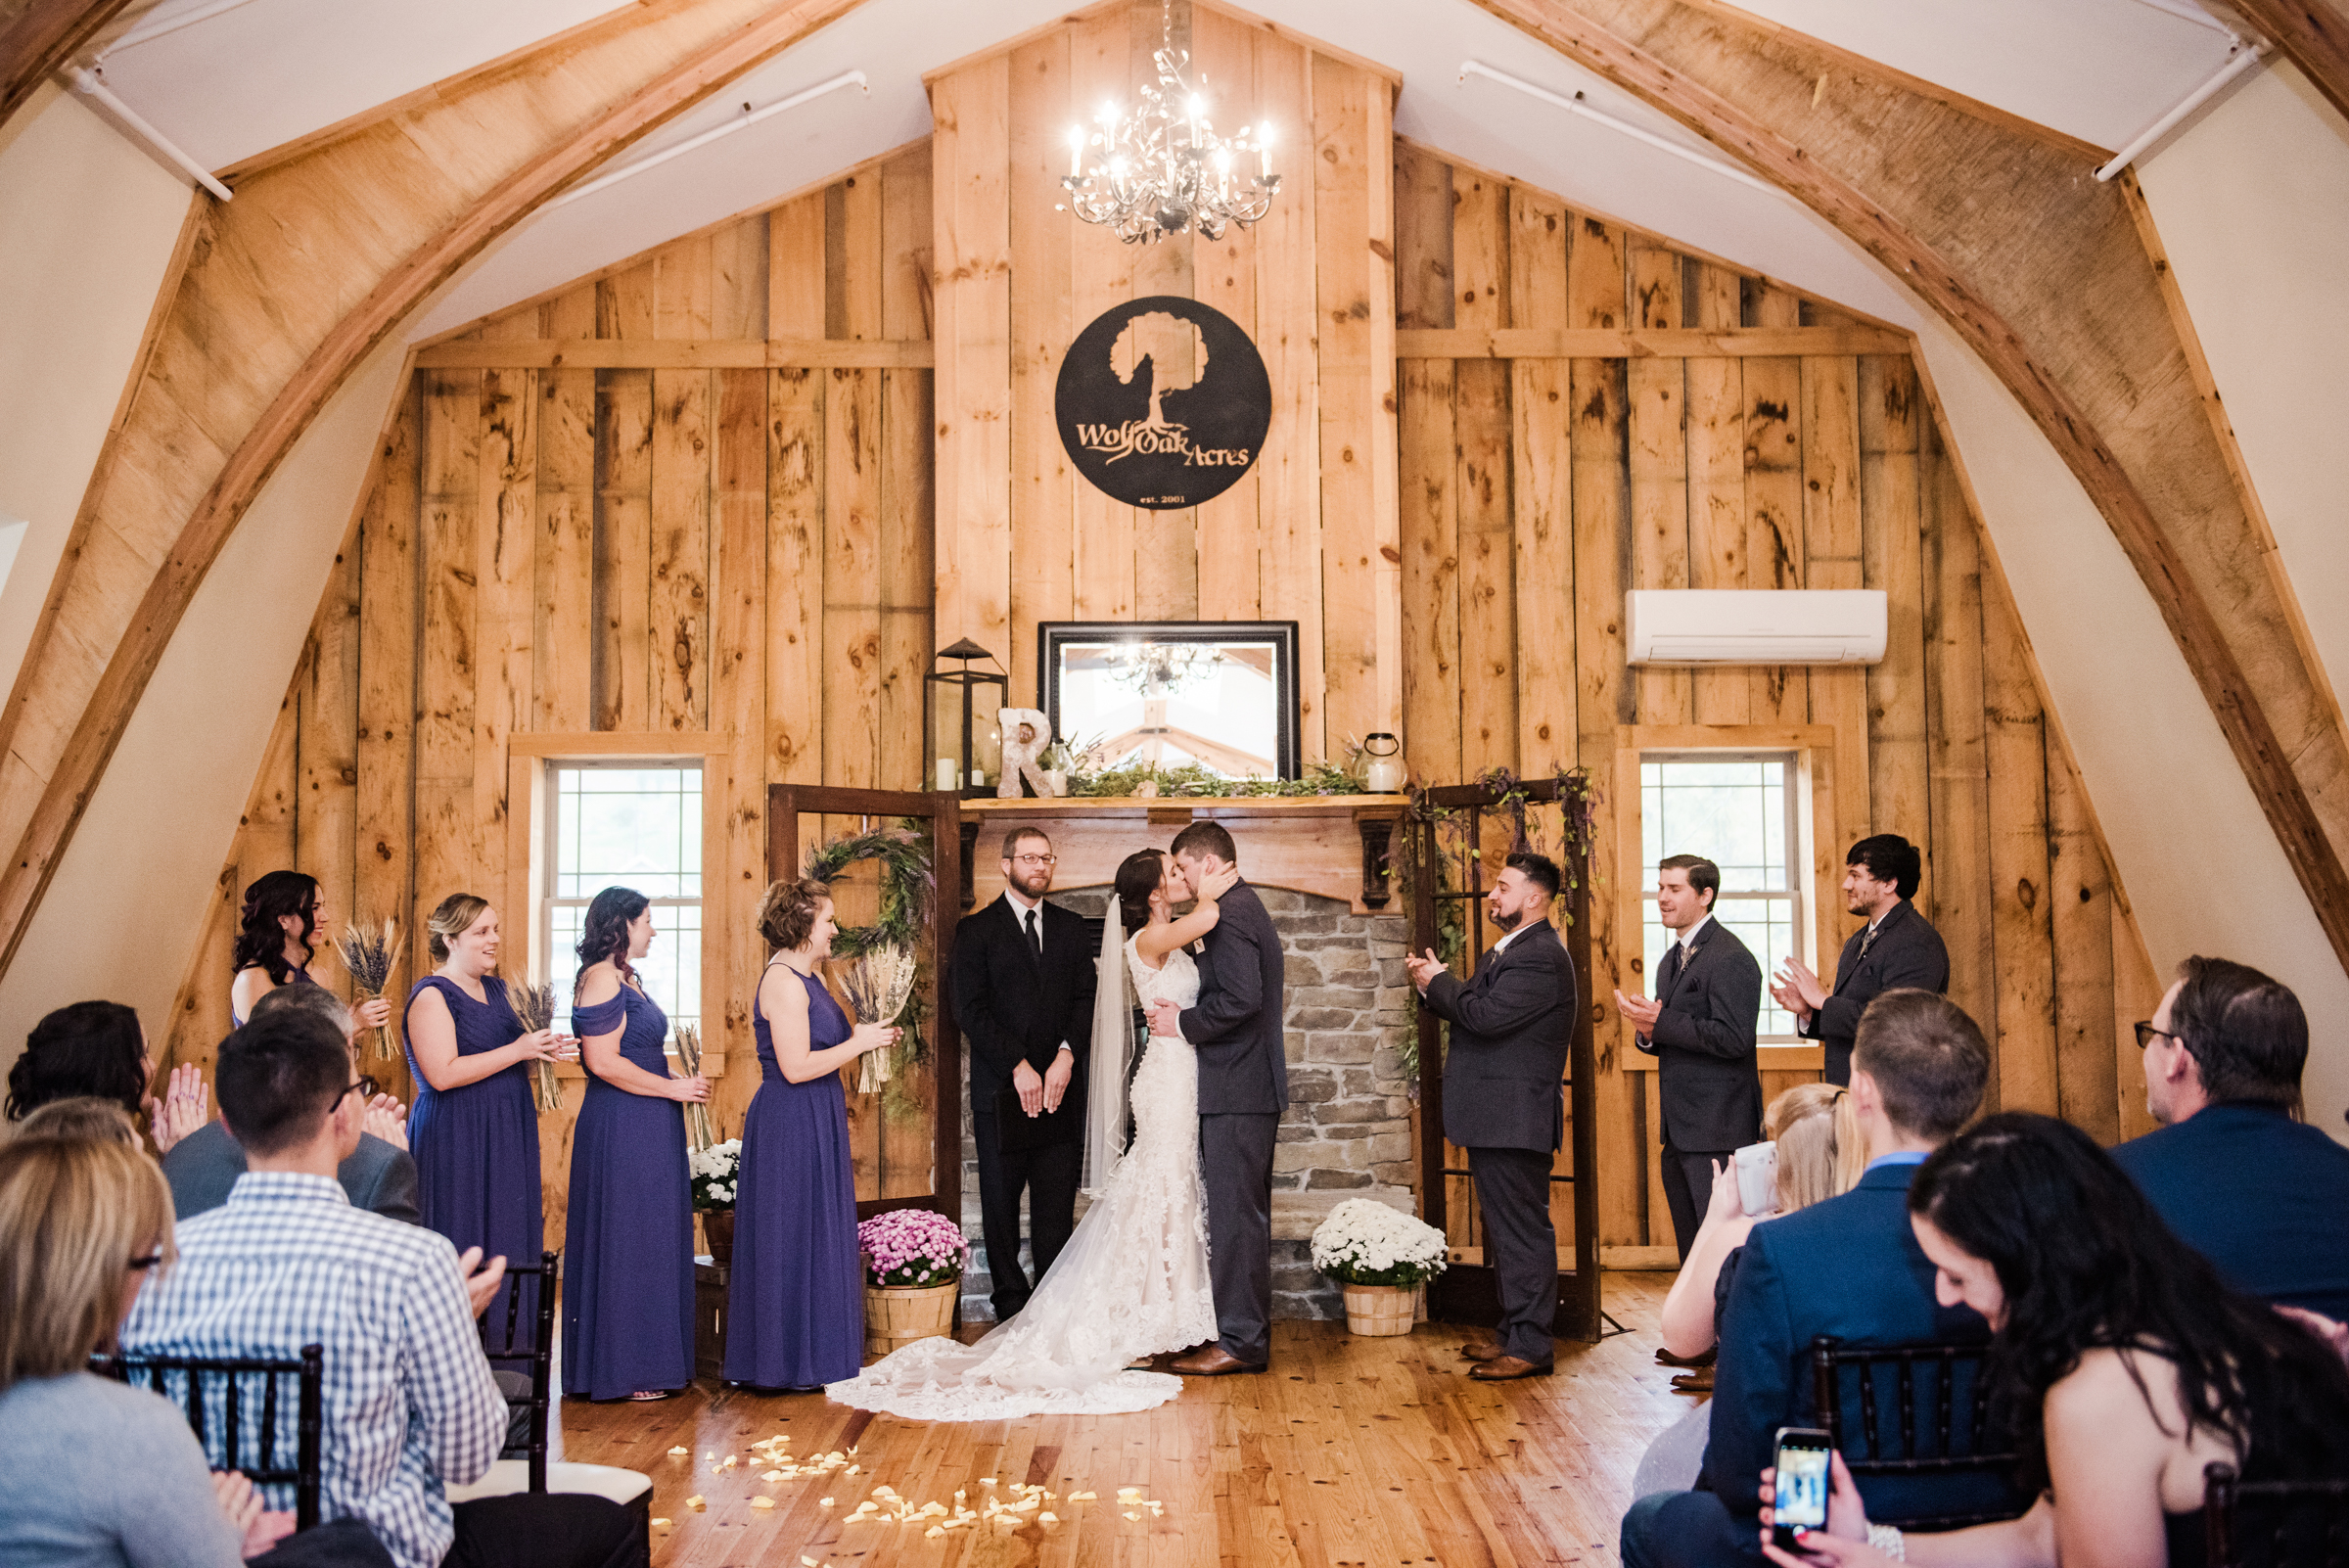 Wolf_Oak_Acres_Central_NY_Wedding_JILL_STUDIO_Rochester_NY_Photographer_DSC_7251.jpg